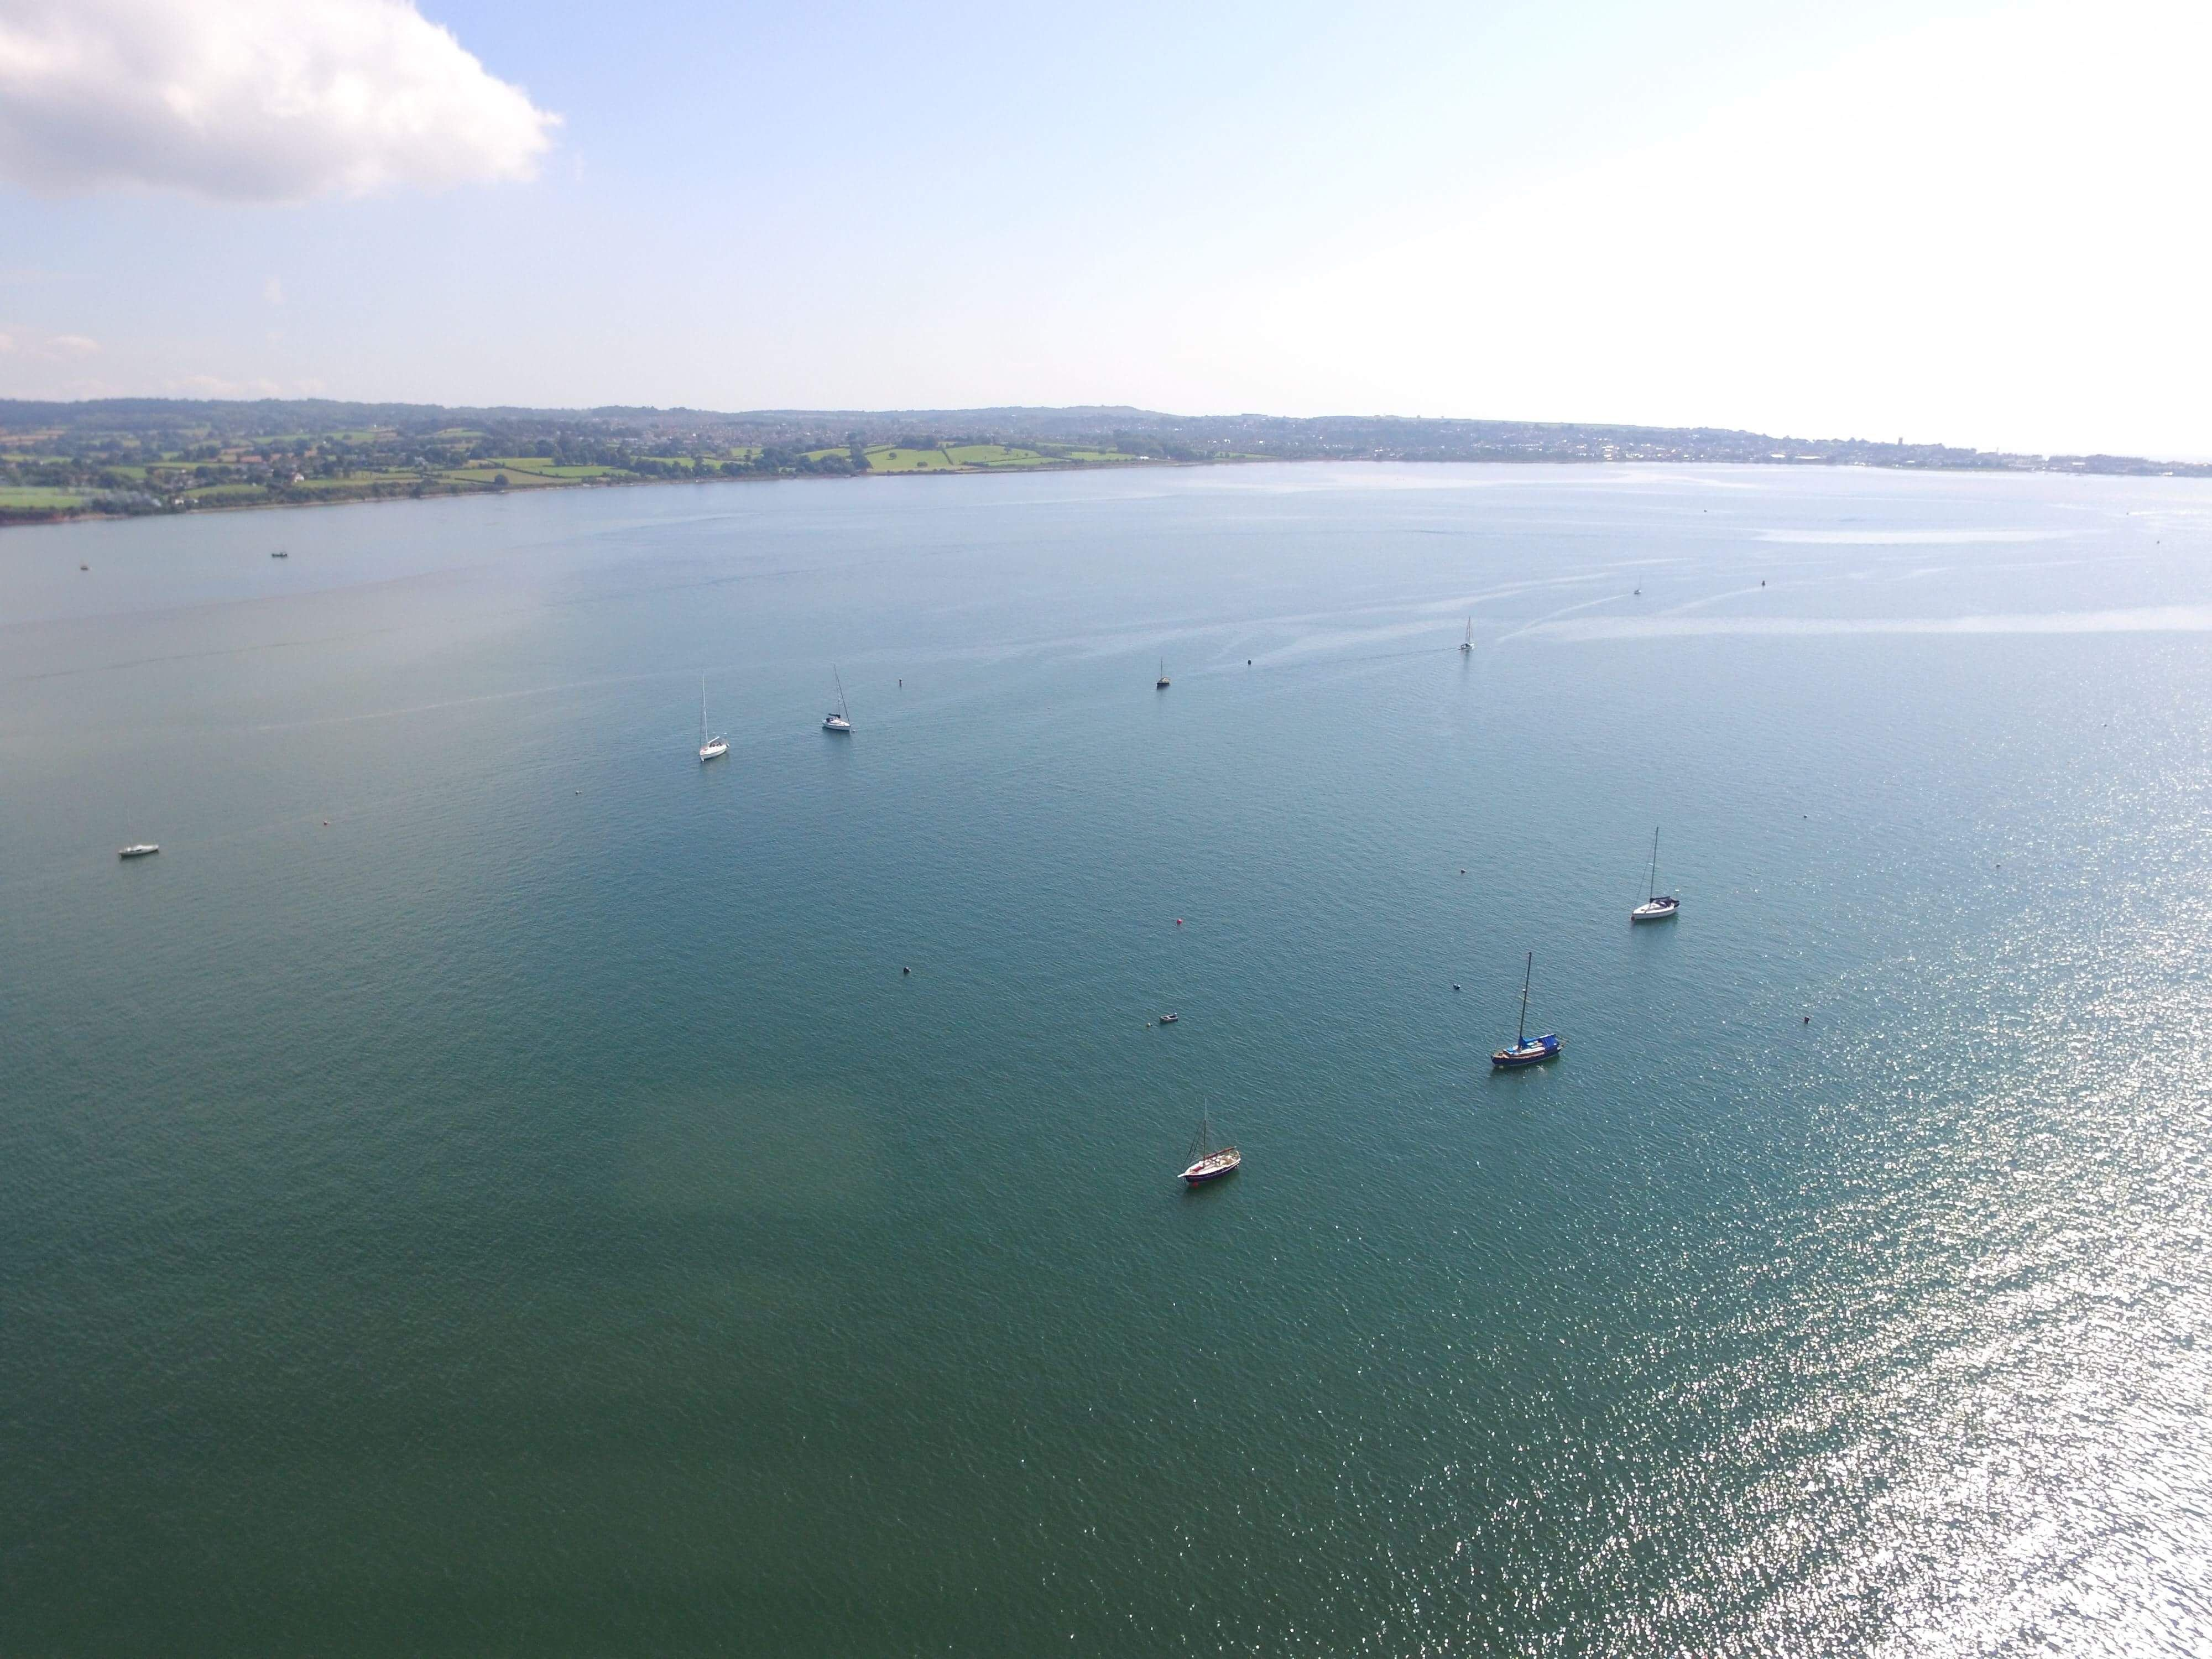 Plenty of boat activity on the Exe Estuary Water, Boat